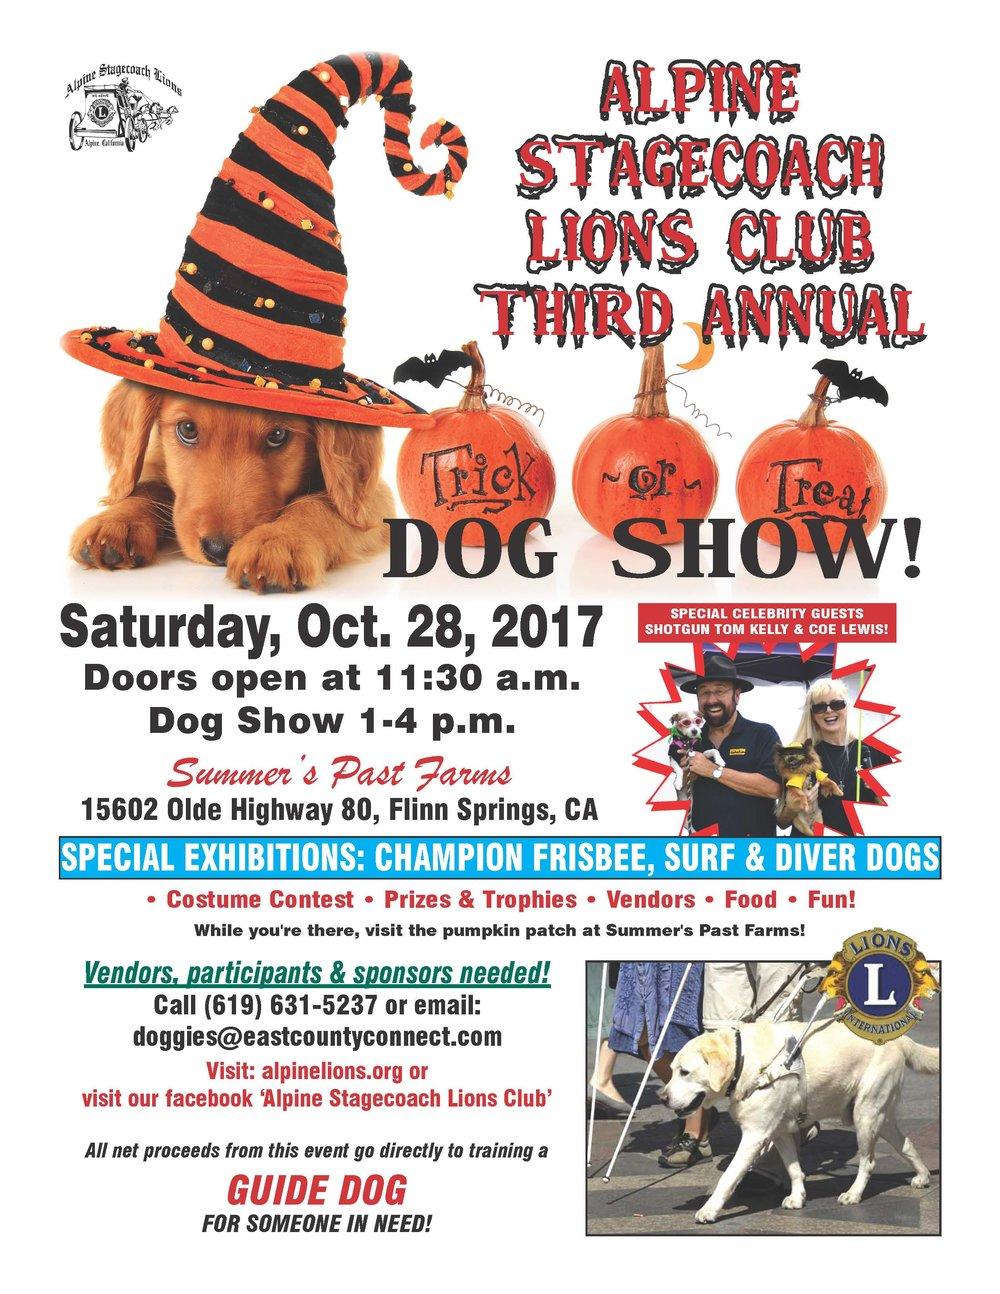 Dog Show flyer 2017 2.jpg